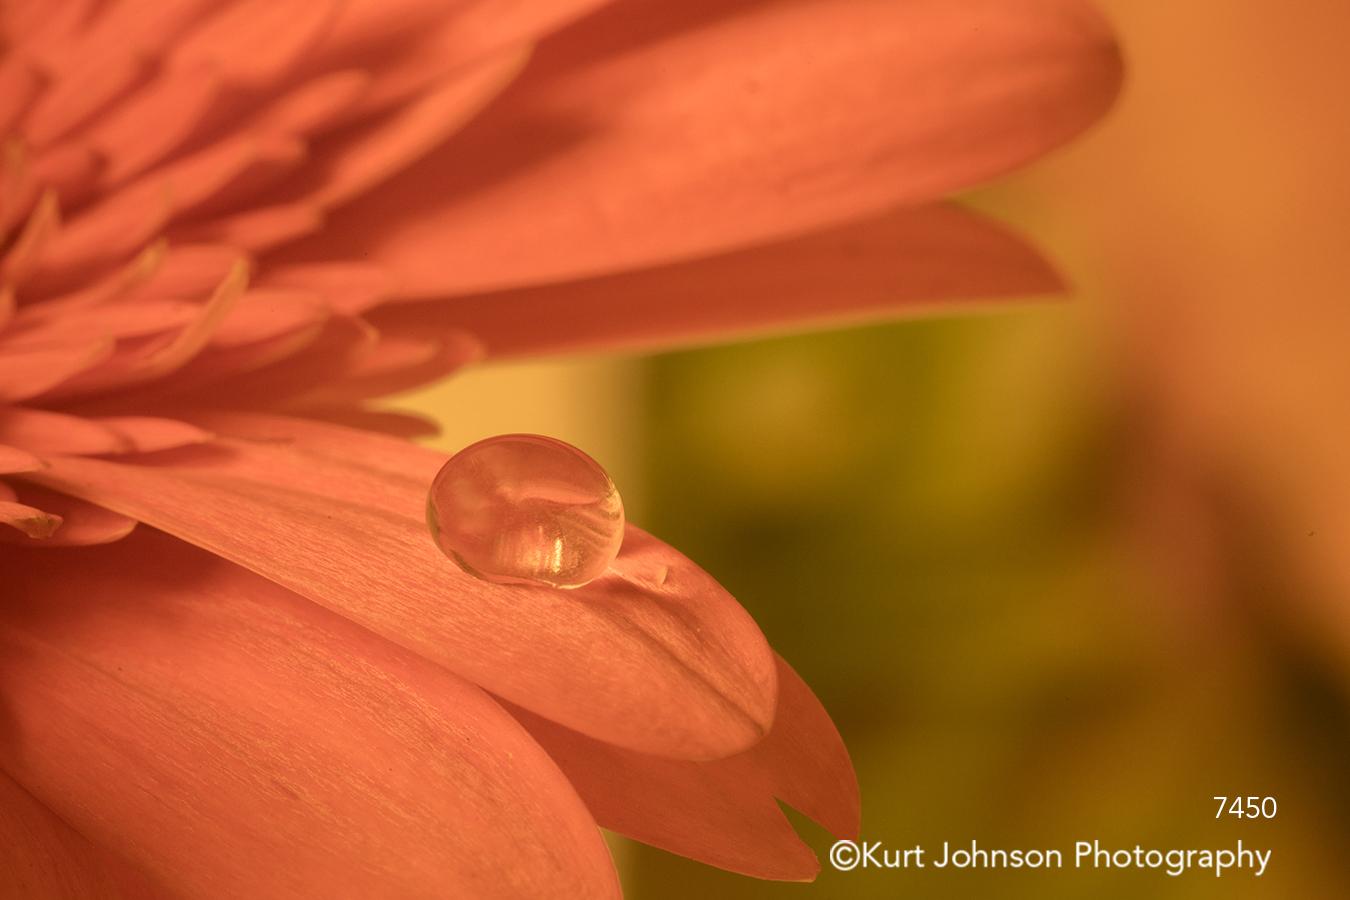 red flower close up detail petal petals water drop gerbera daisy colorful